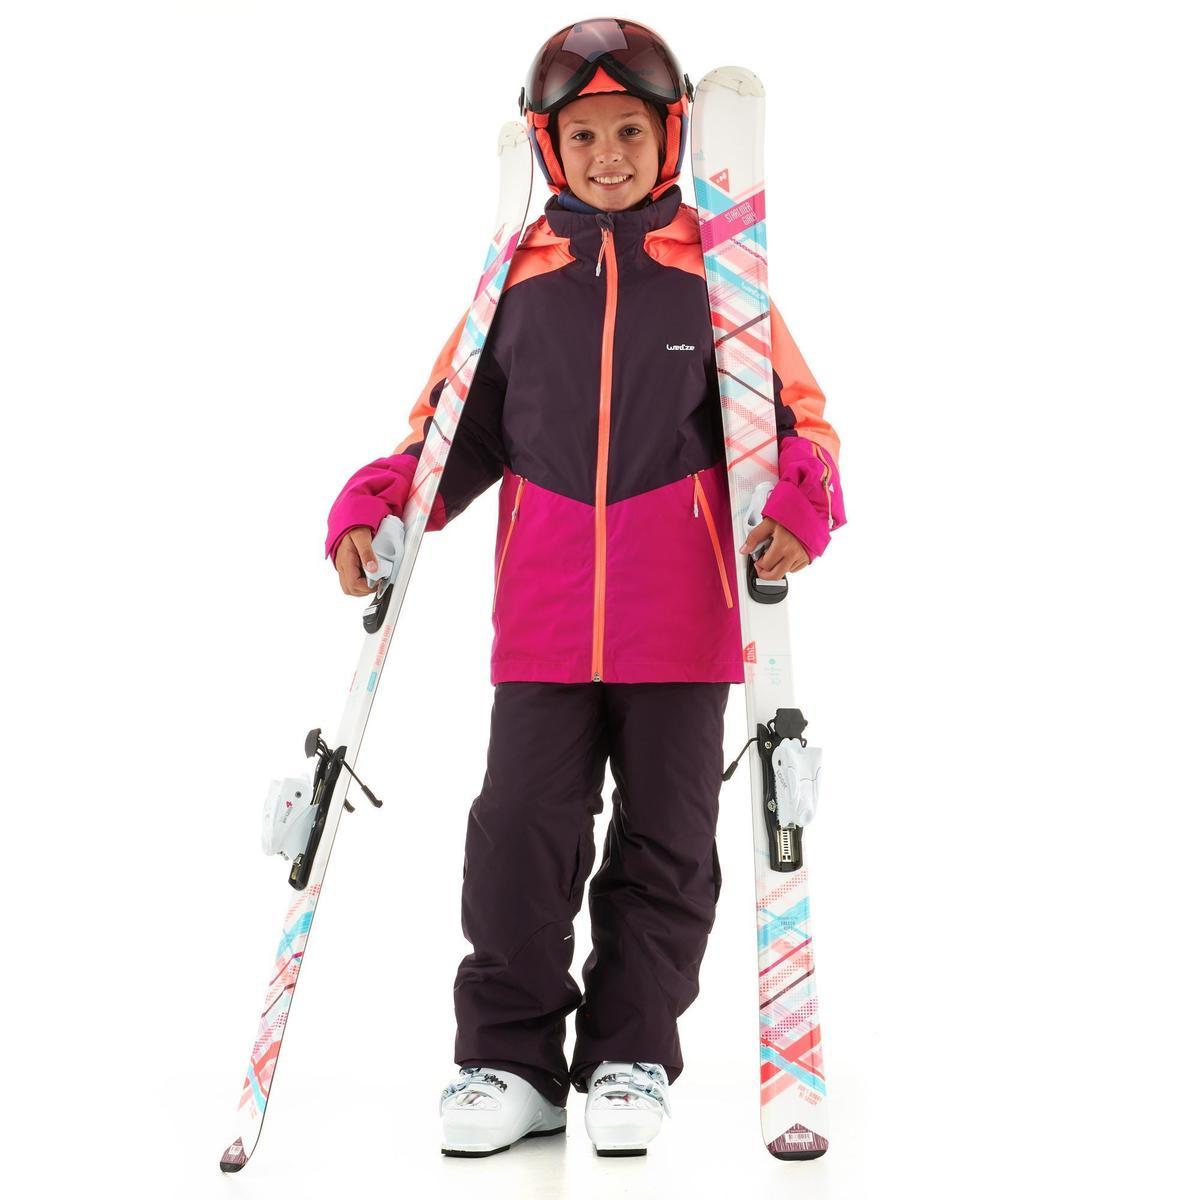 Bild 2 von Skijacke Piste 580 Kinder rosa/violett